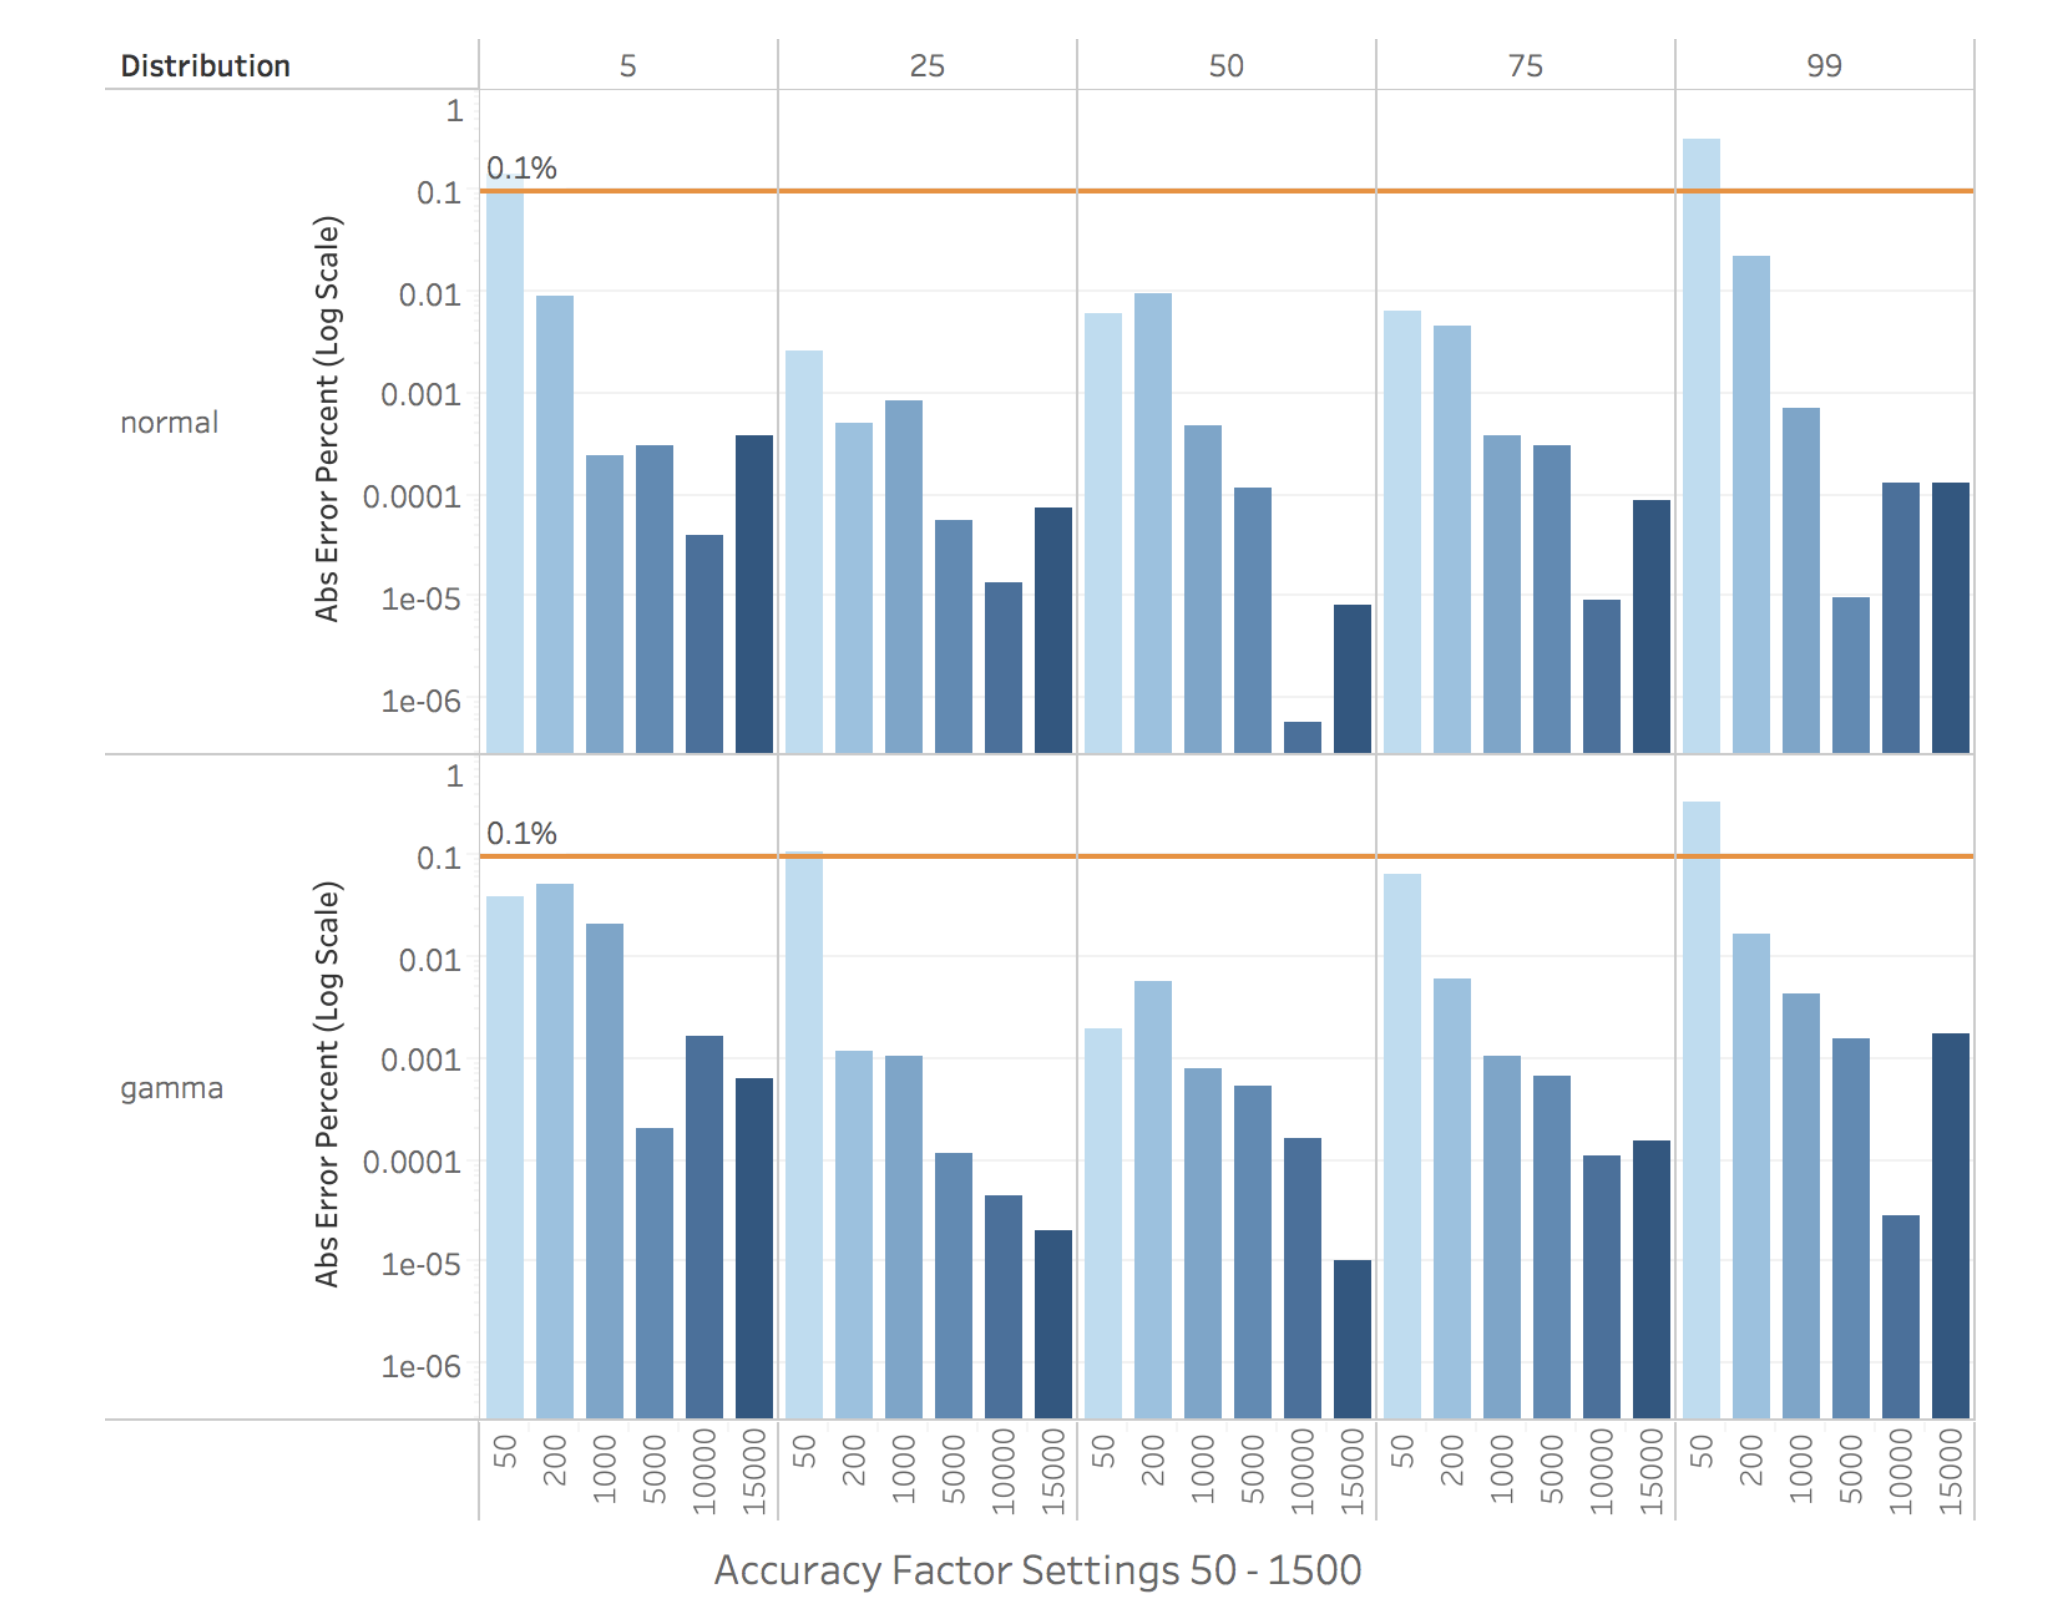 Figure 12. Percentile Estimation Error by Accuracy Factor